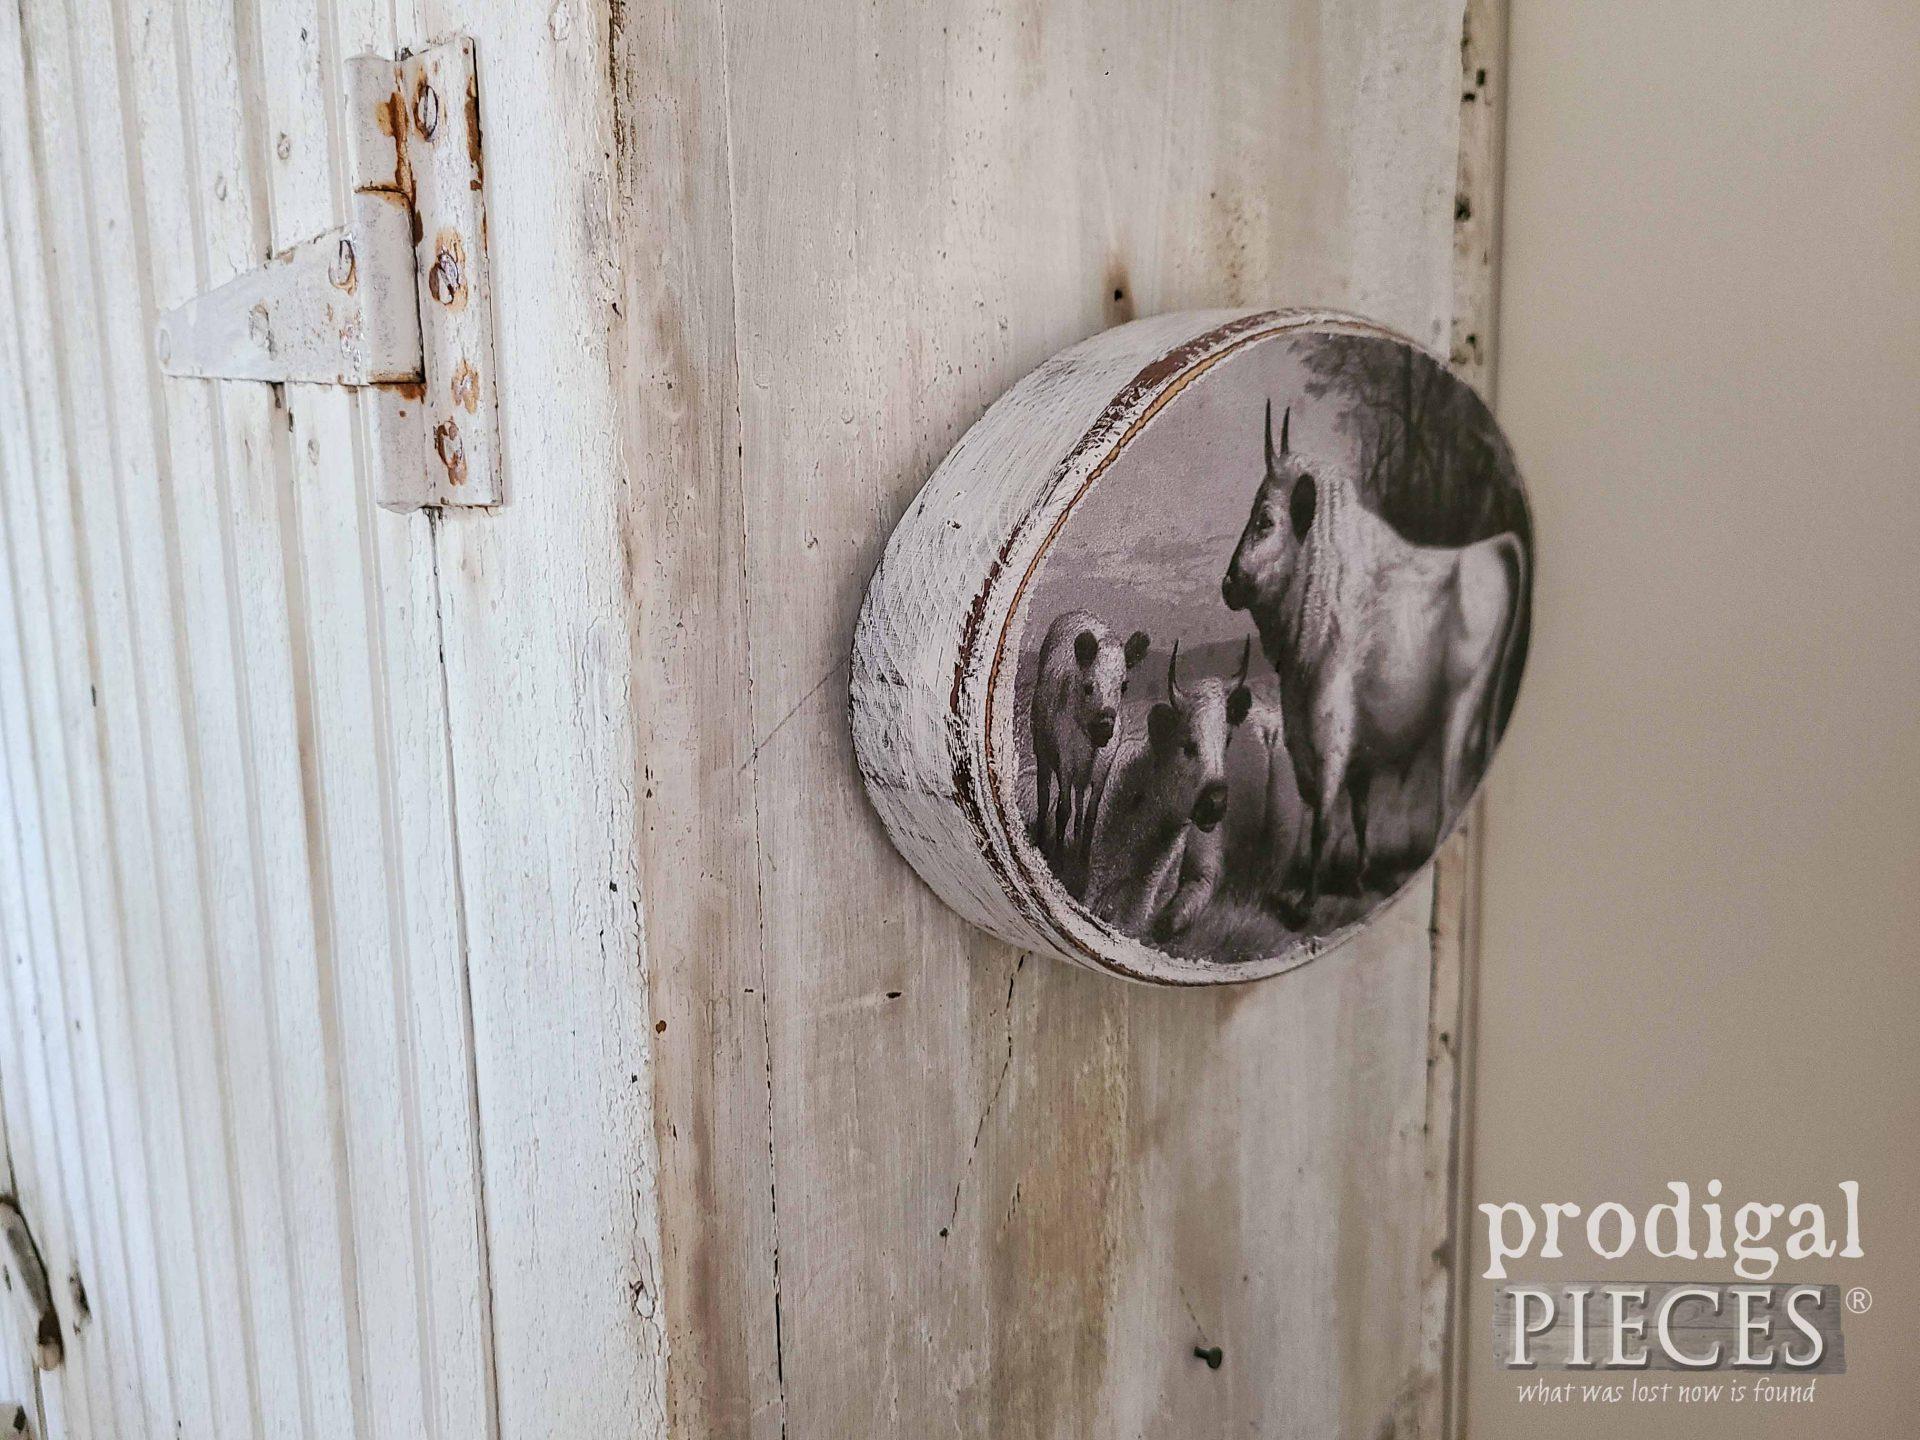 DIY Cow Print Art for Farmhouse Decor by Larissa of Prodigal Pieces | prodigalpieces.com #prodigalpieces #cow #farmhouse #art